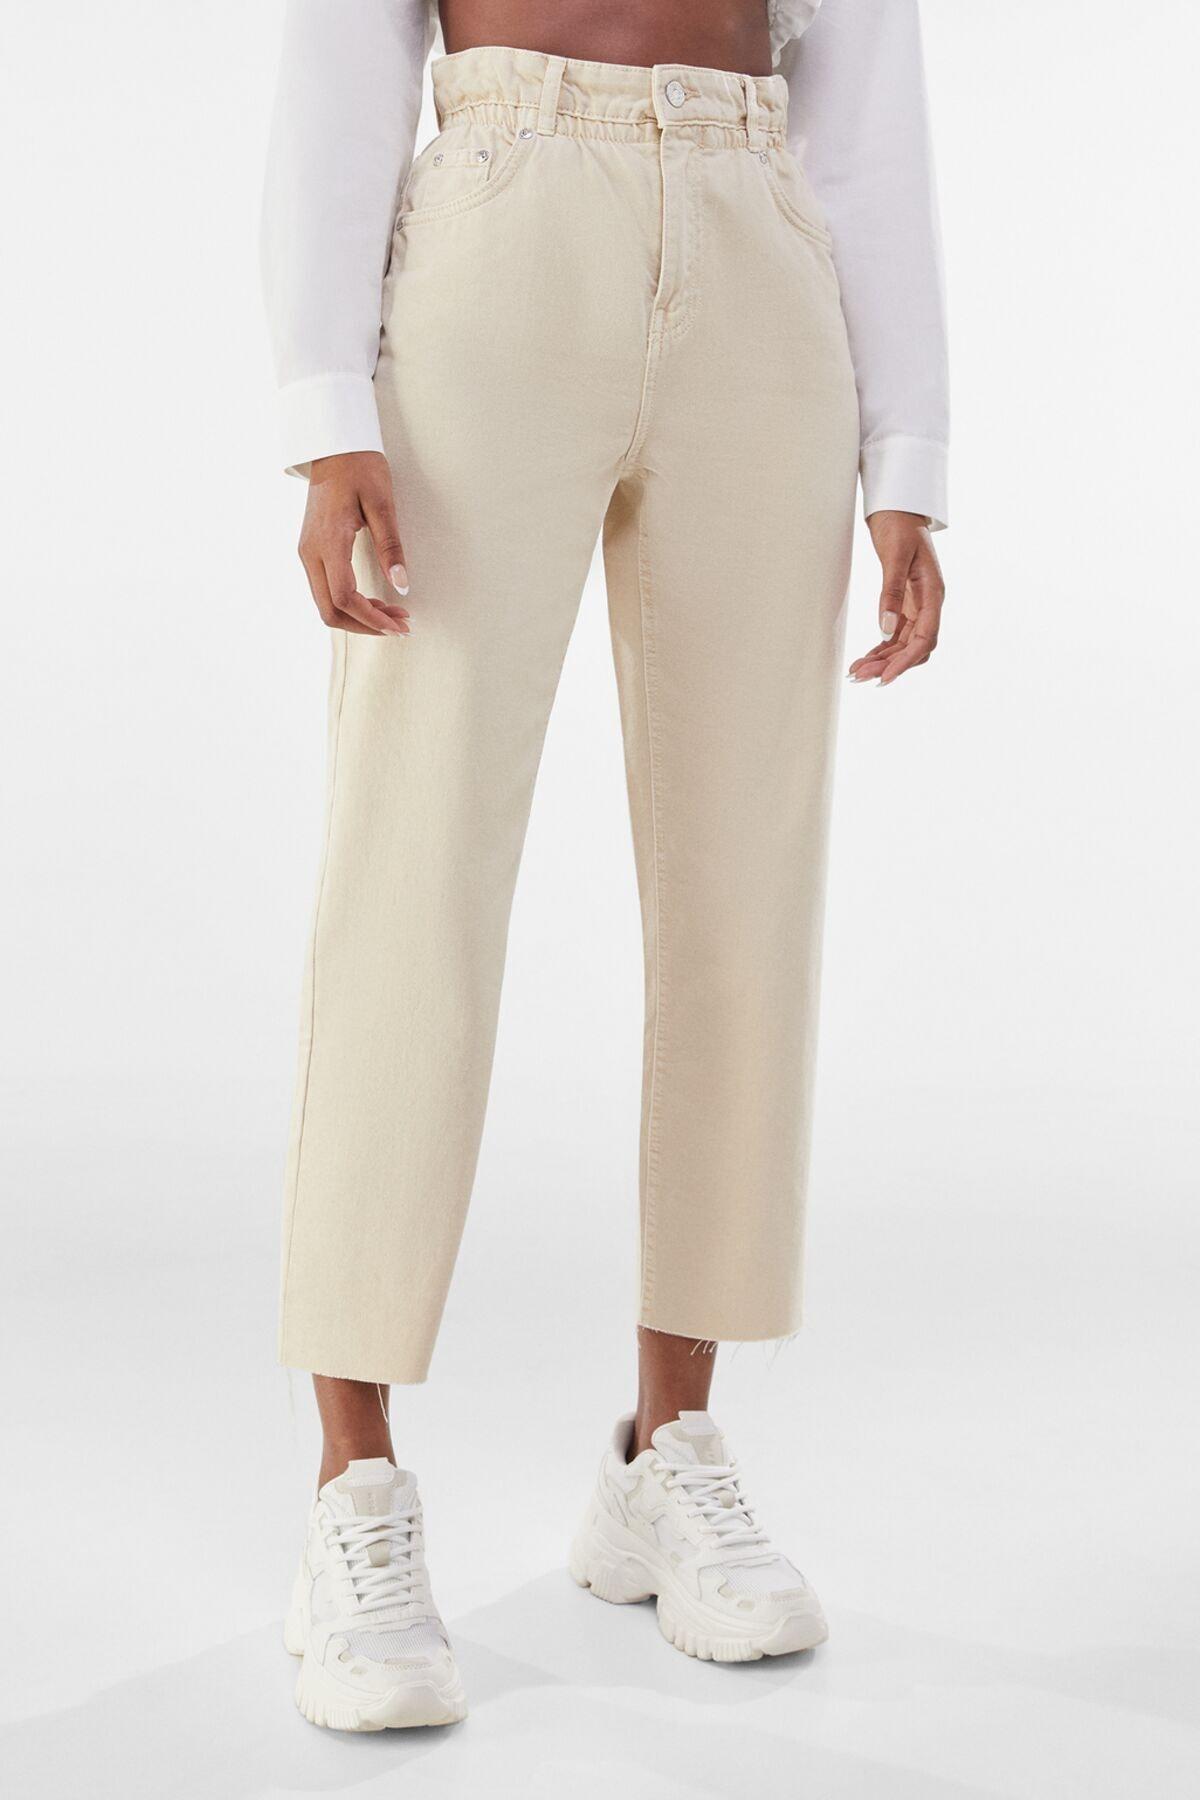 Bershka Kadın Kum Rengi Fitilli Crop Straight Fit Pantolon 00251019